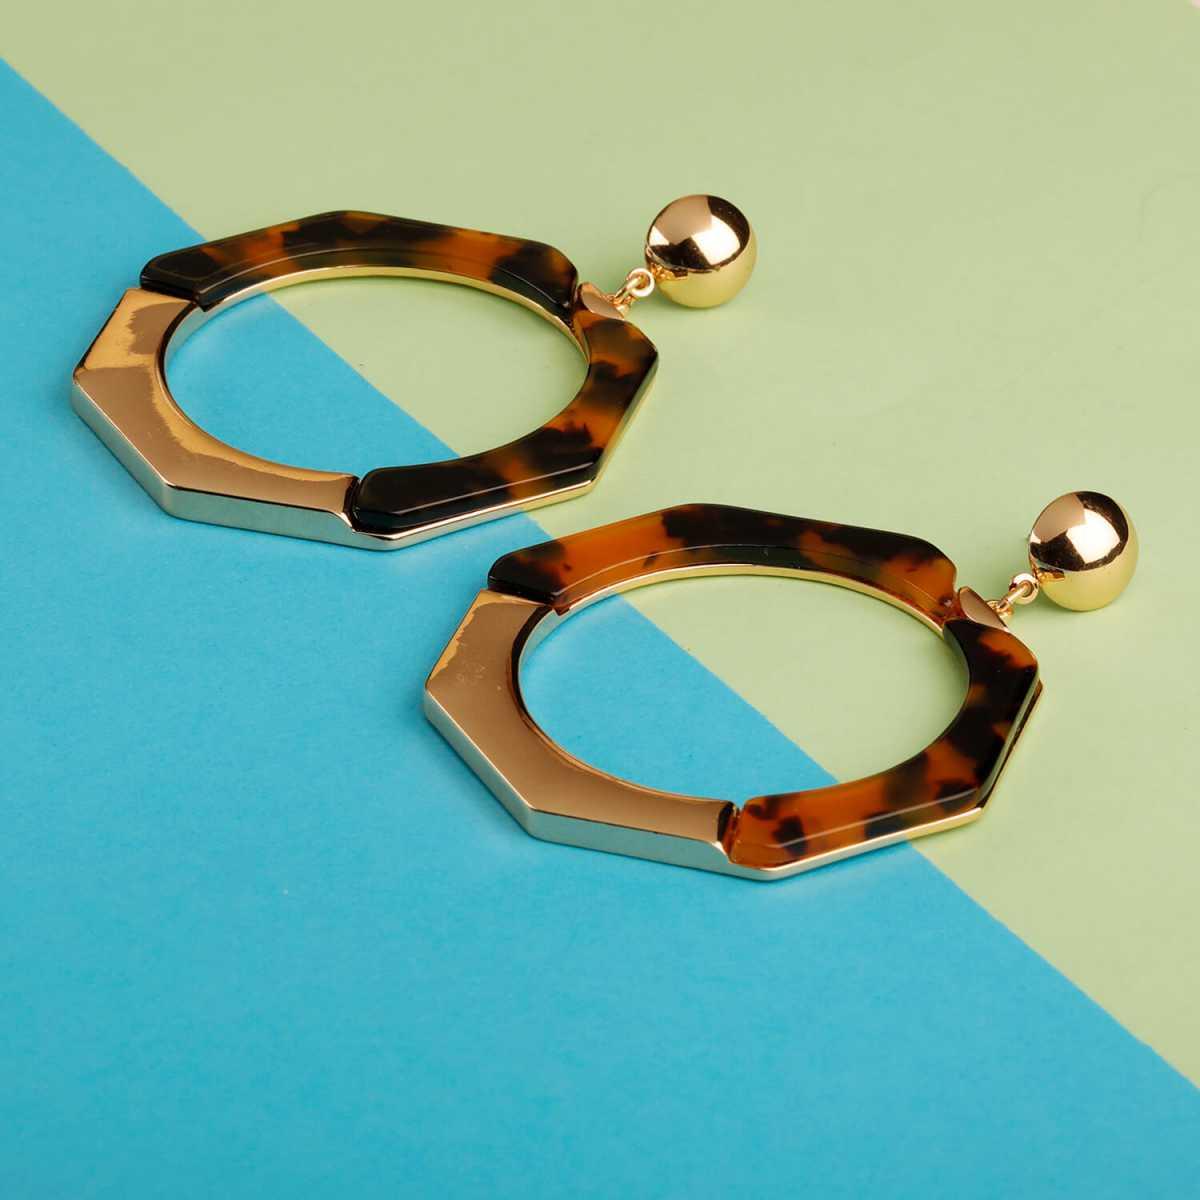 Silver Shine Metallic Hexagonal Shape Partywear Earring For Girls and Women Jewellery